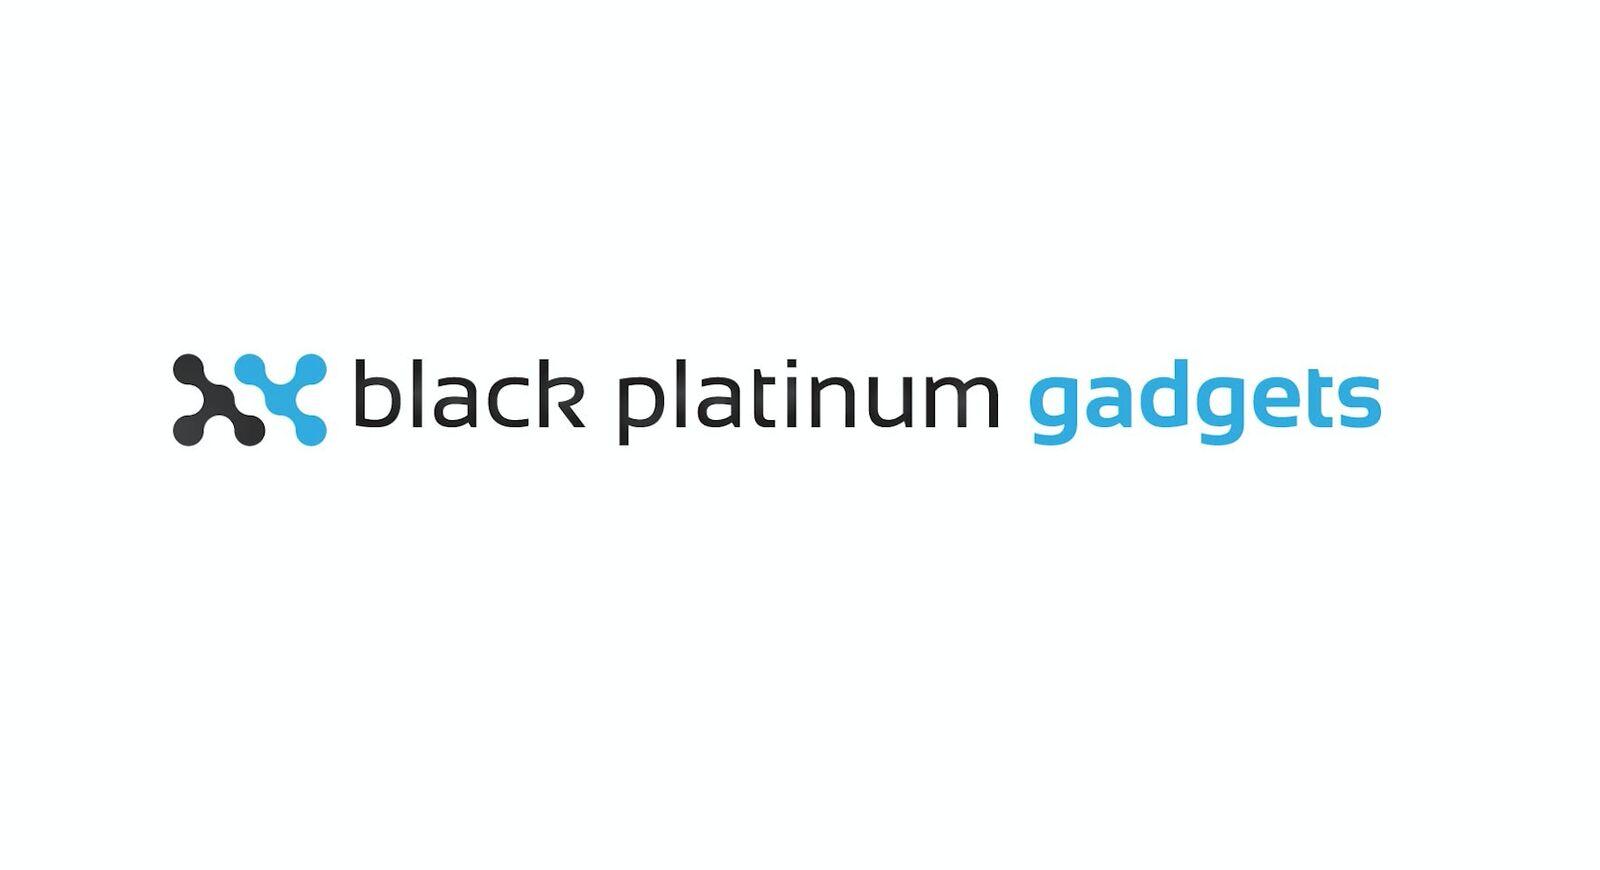 BlackPlatinumGadgets